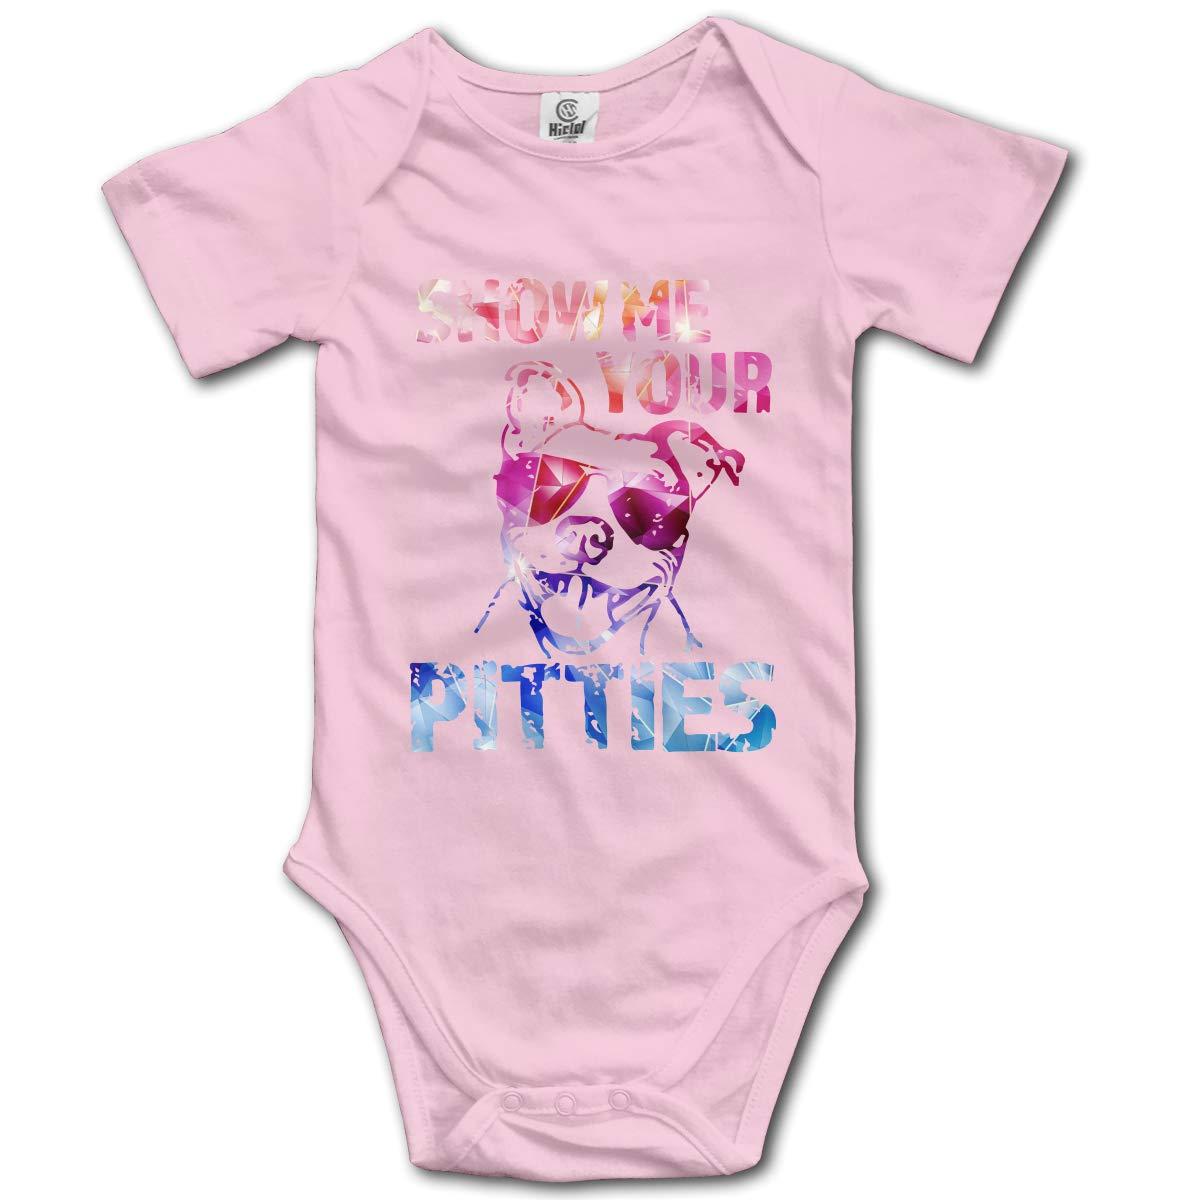 CHETI Show Me Your Pitties Newborn Infant Toddler Baby Girls Boys Bodysuit Short Sleeve 0-24 MonthsGray